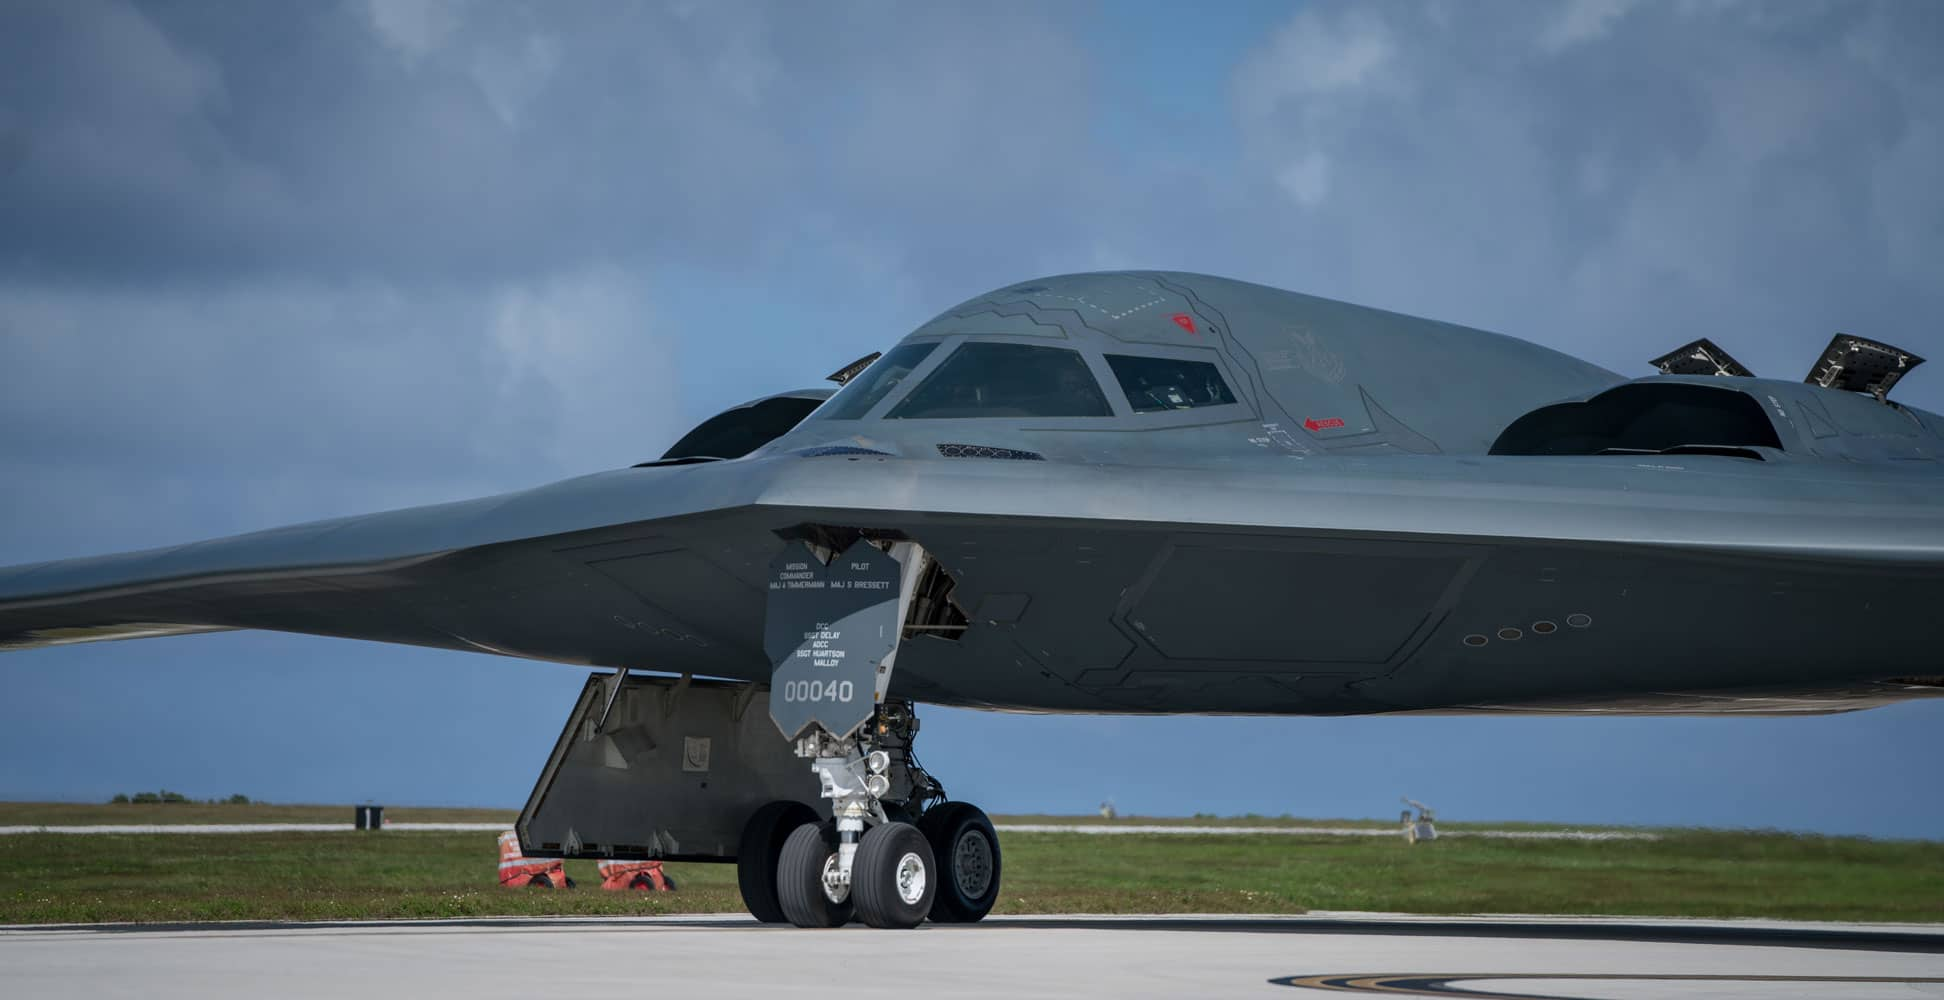 United States Air Force B-2 Spirit